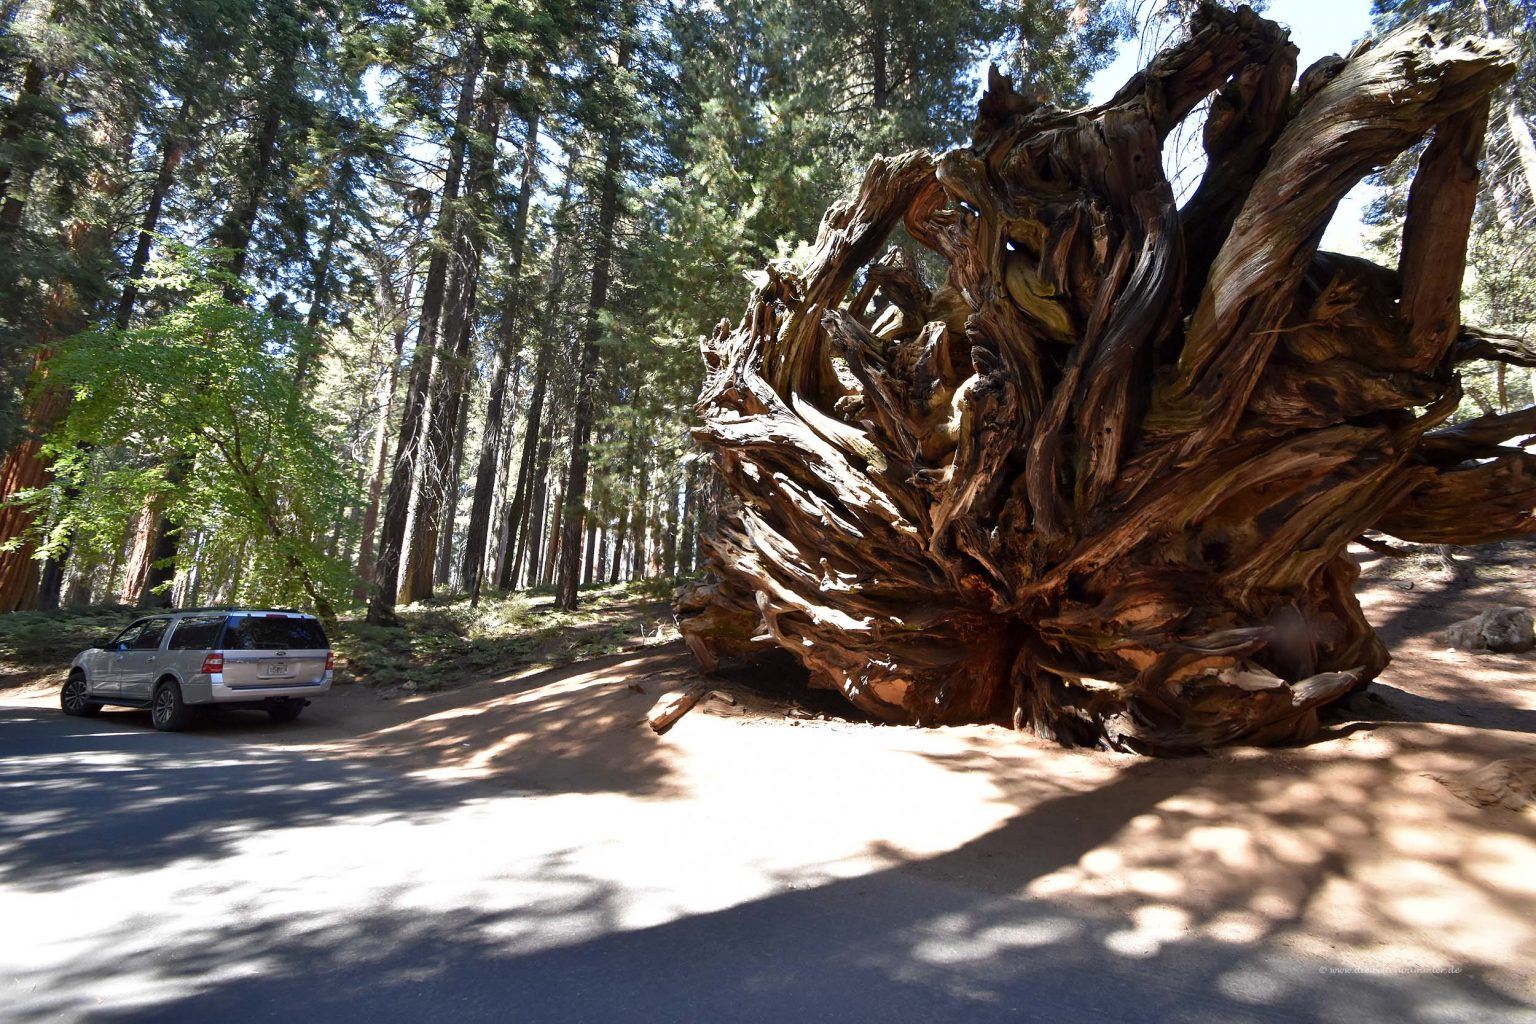 Wurzeln eines umgestürzten Mammutbaums